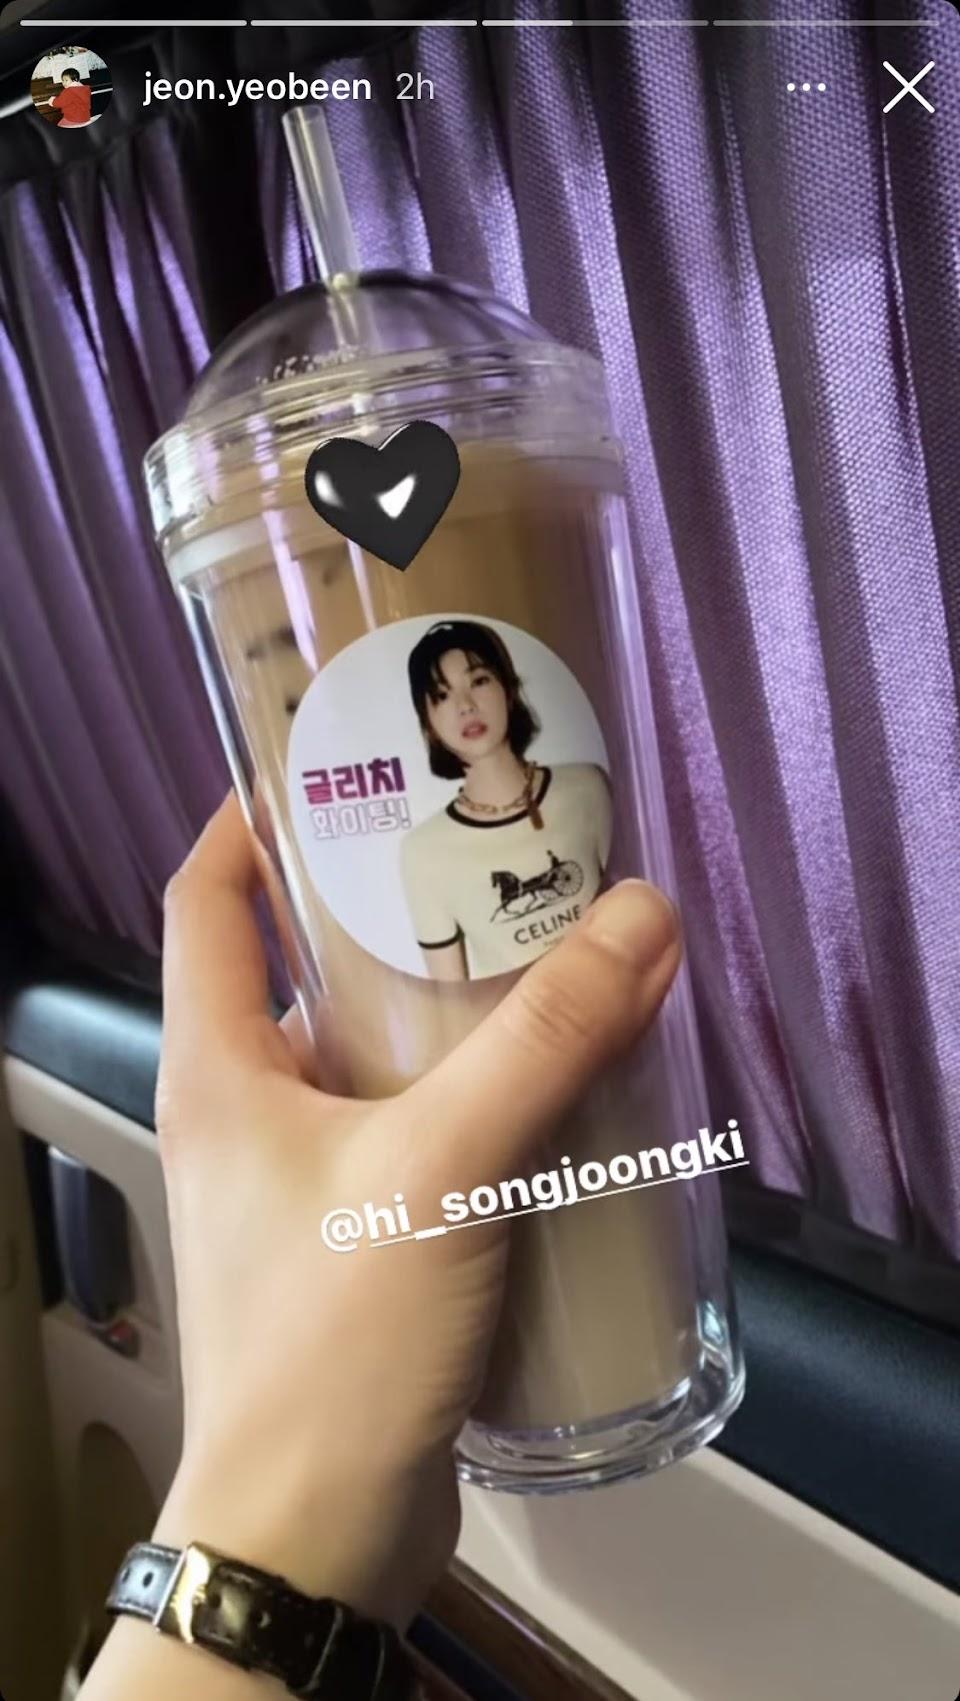 jeon.yeobeen ig coffee pic